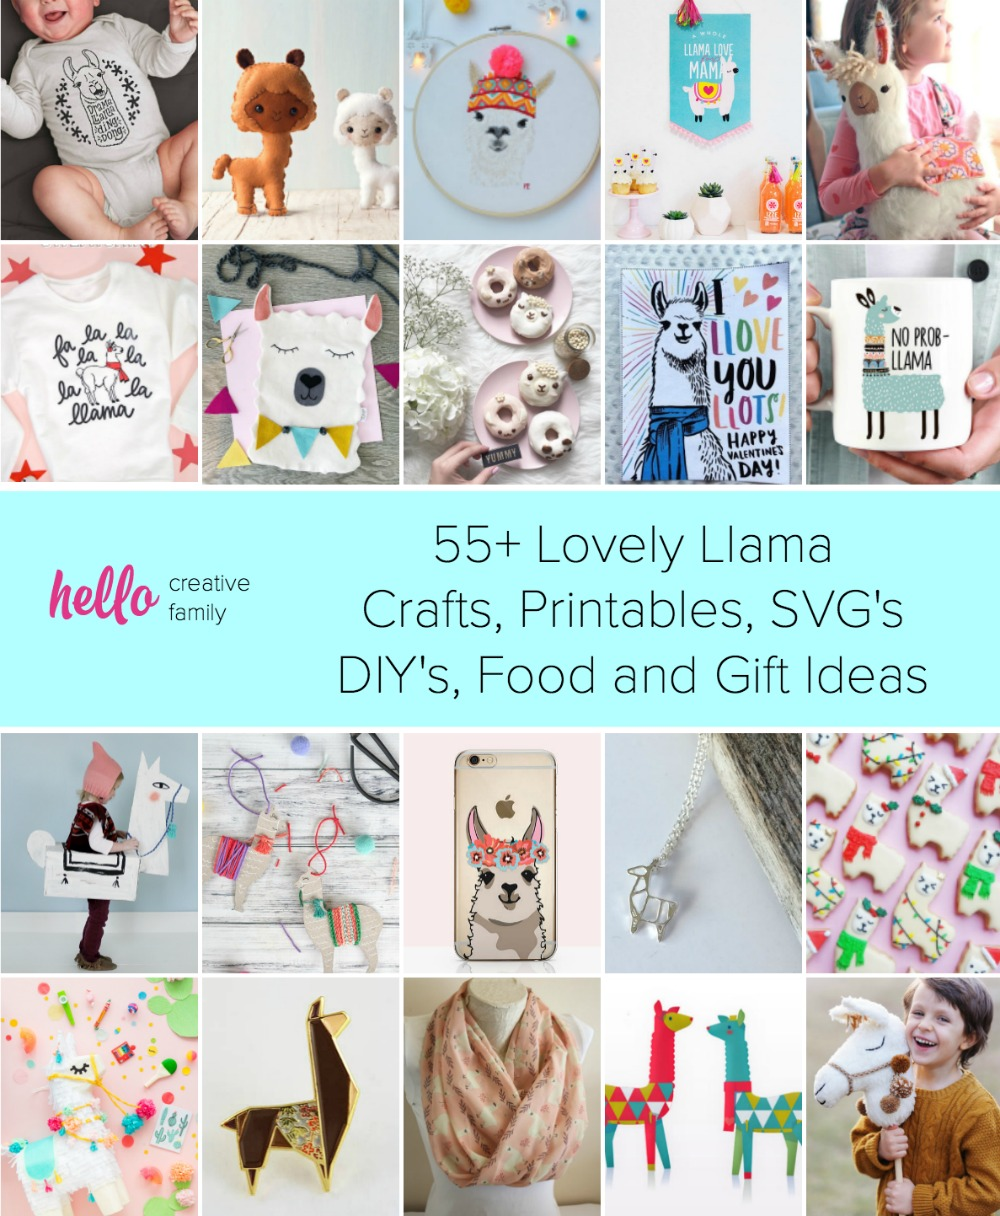 photo regarding Diy Printables titled 55+ Beautiful Llama Crafts, Printables, SVGs DIYs, Meals and